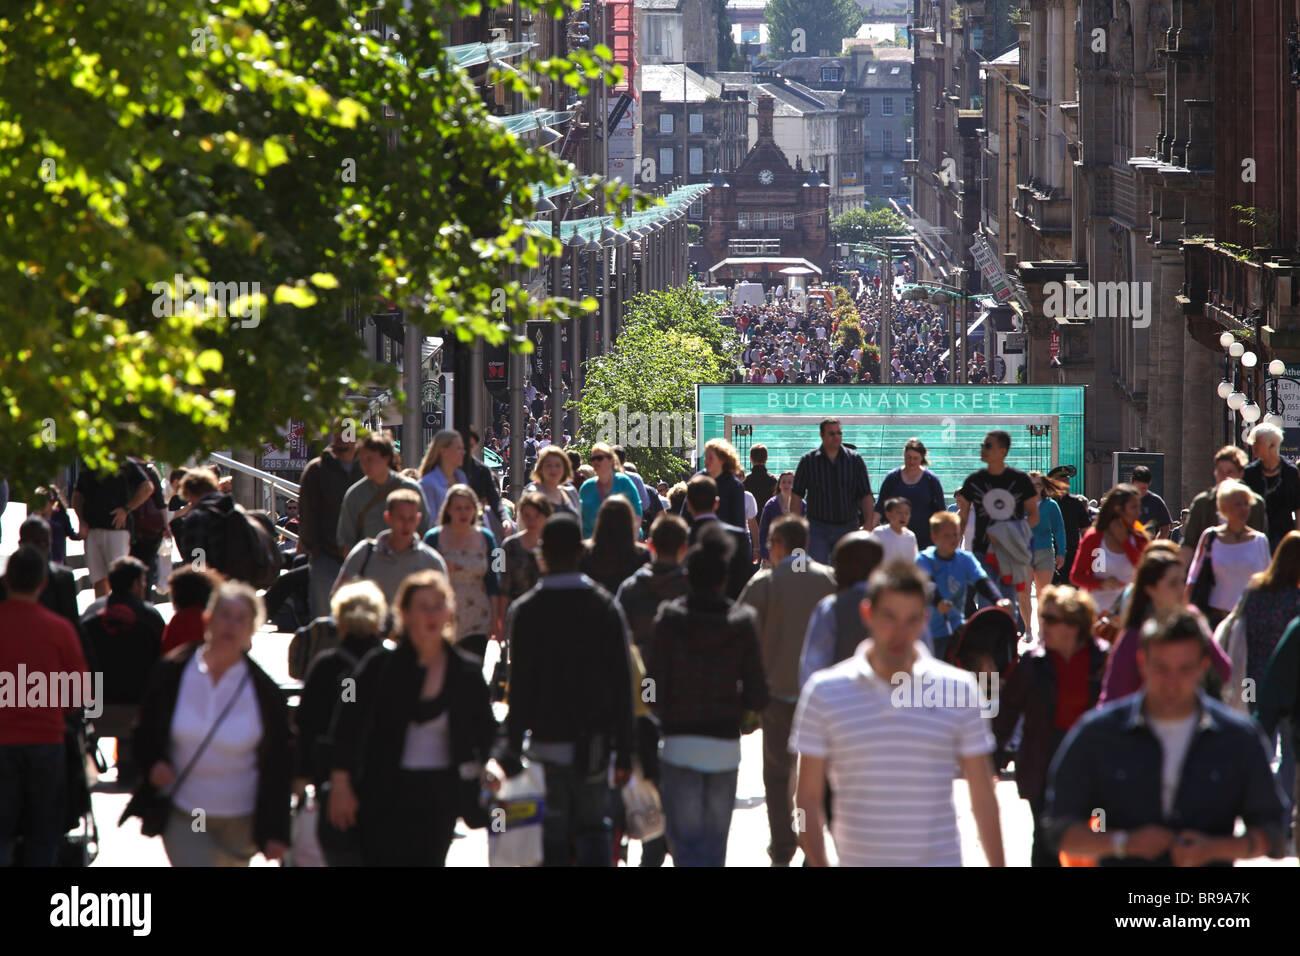 Pedestrians walking on Buchanan Street in Glasgow city centre, Scotland UK - Stock Image